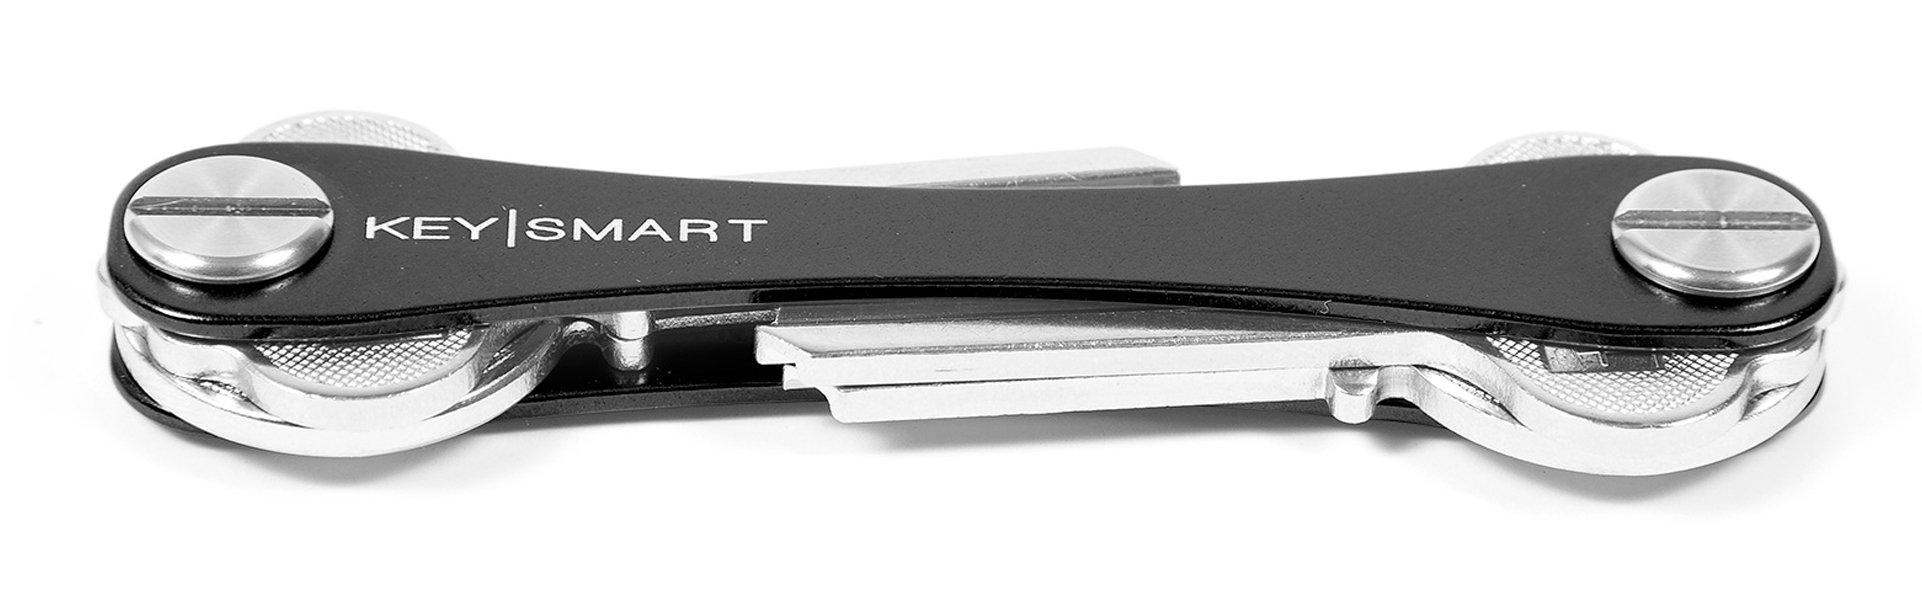 KeySmart - Compact Key Holder and Keychain Organizer (up to 8 Keys, Black)